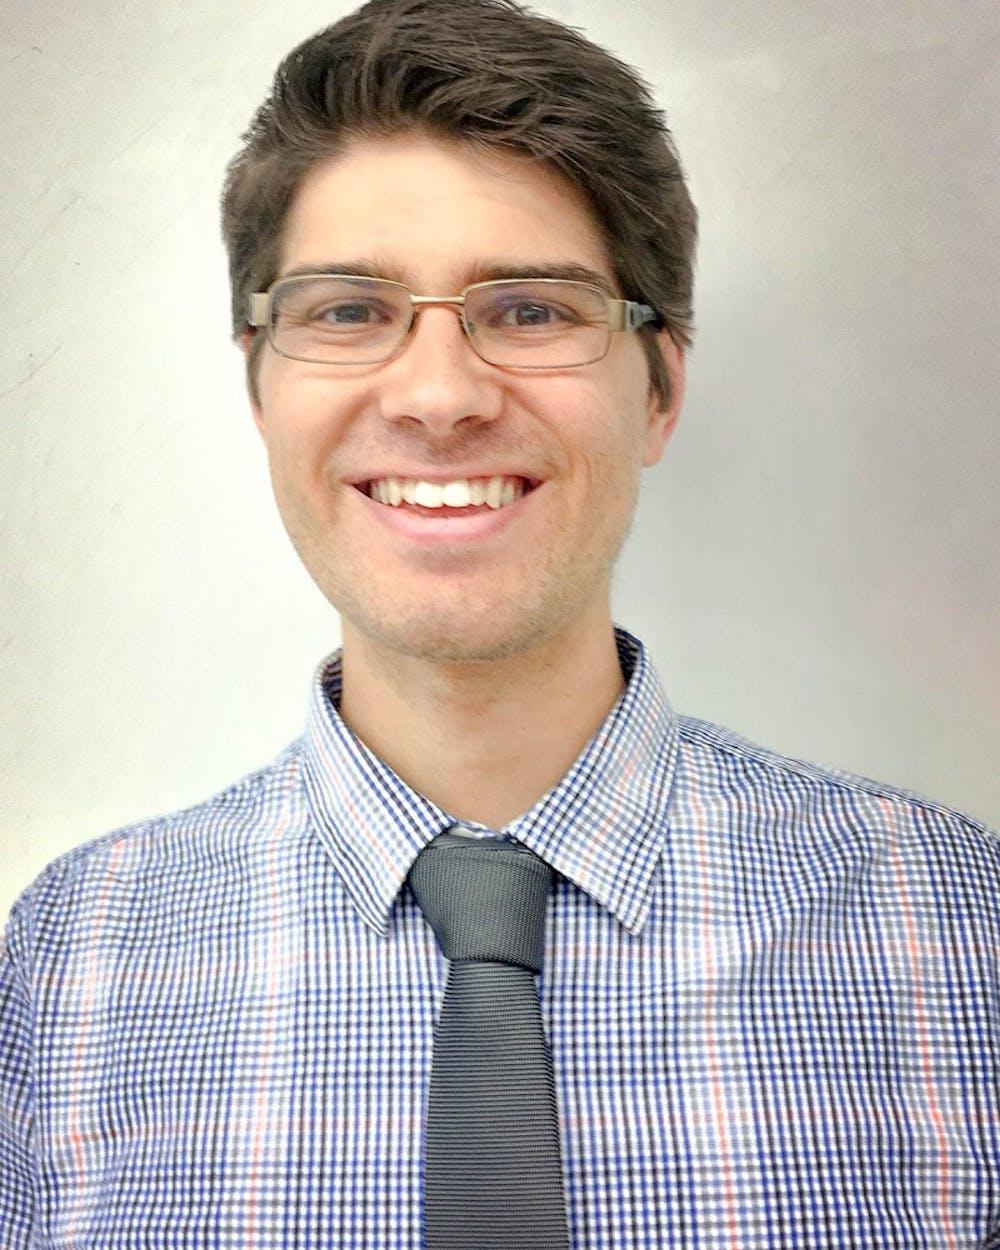 Alumnus receives teaching fellowship